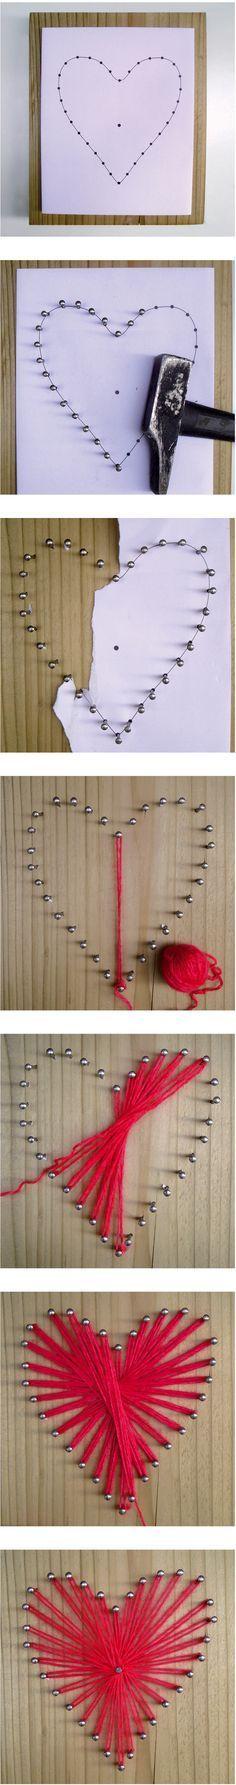 DIY : valentine's string art -  String Art Heart - cœur en fil tendu - tableau de fil - © solange abaziou - http://www.soyou.fr/